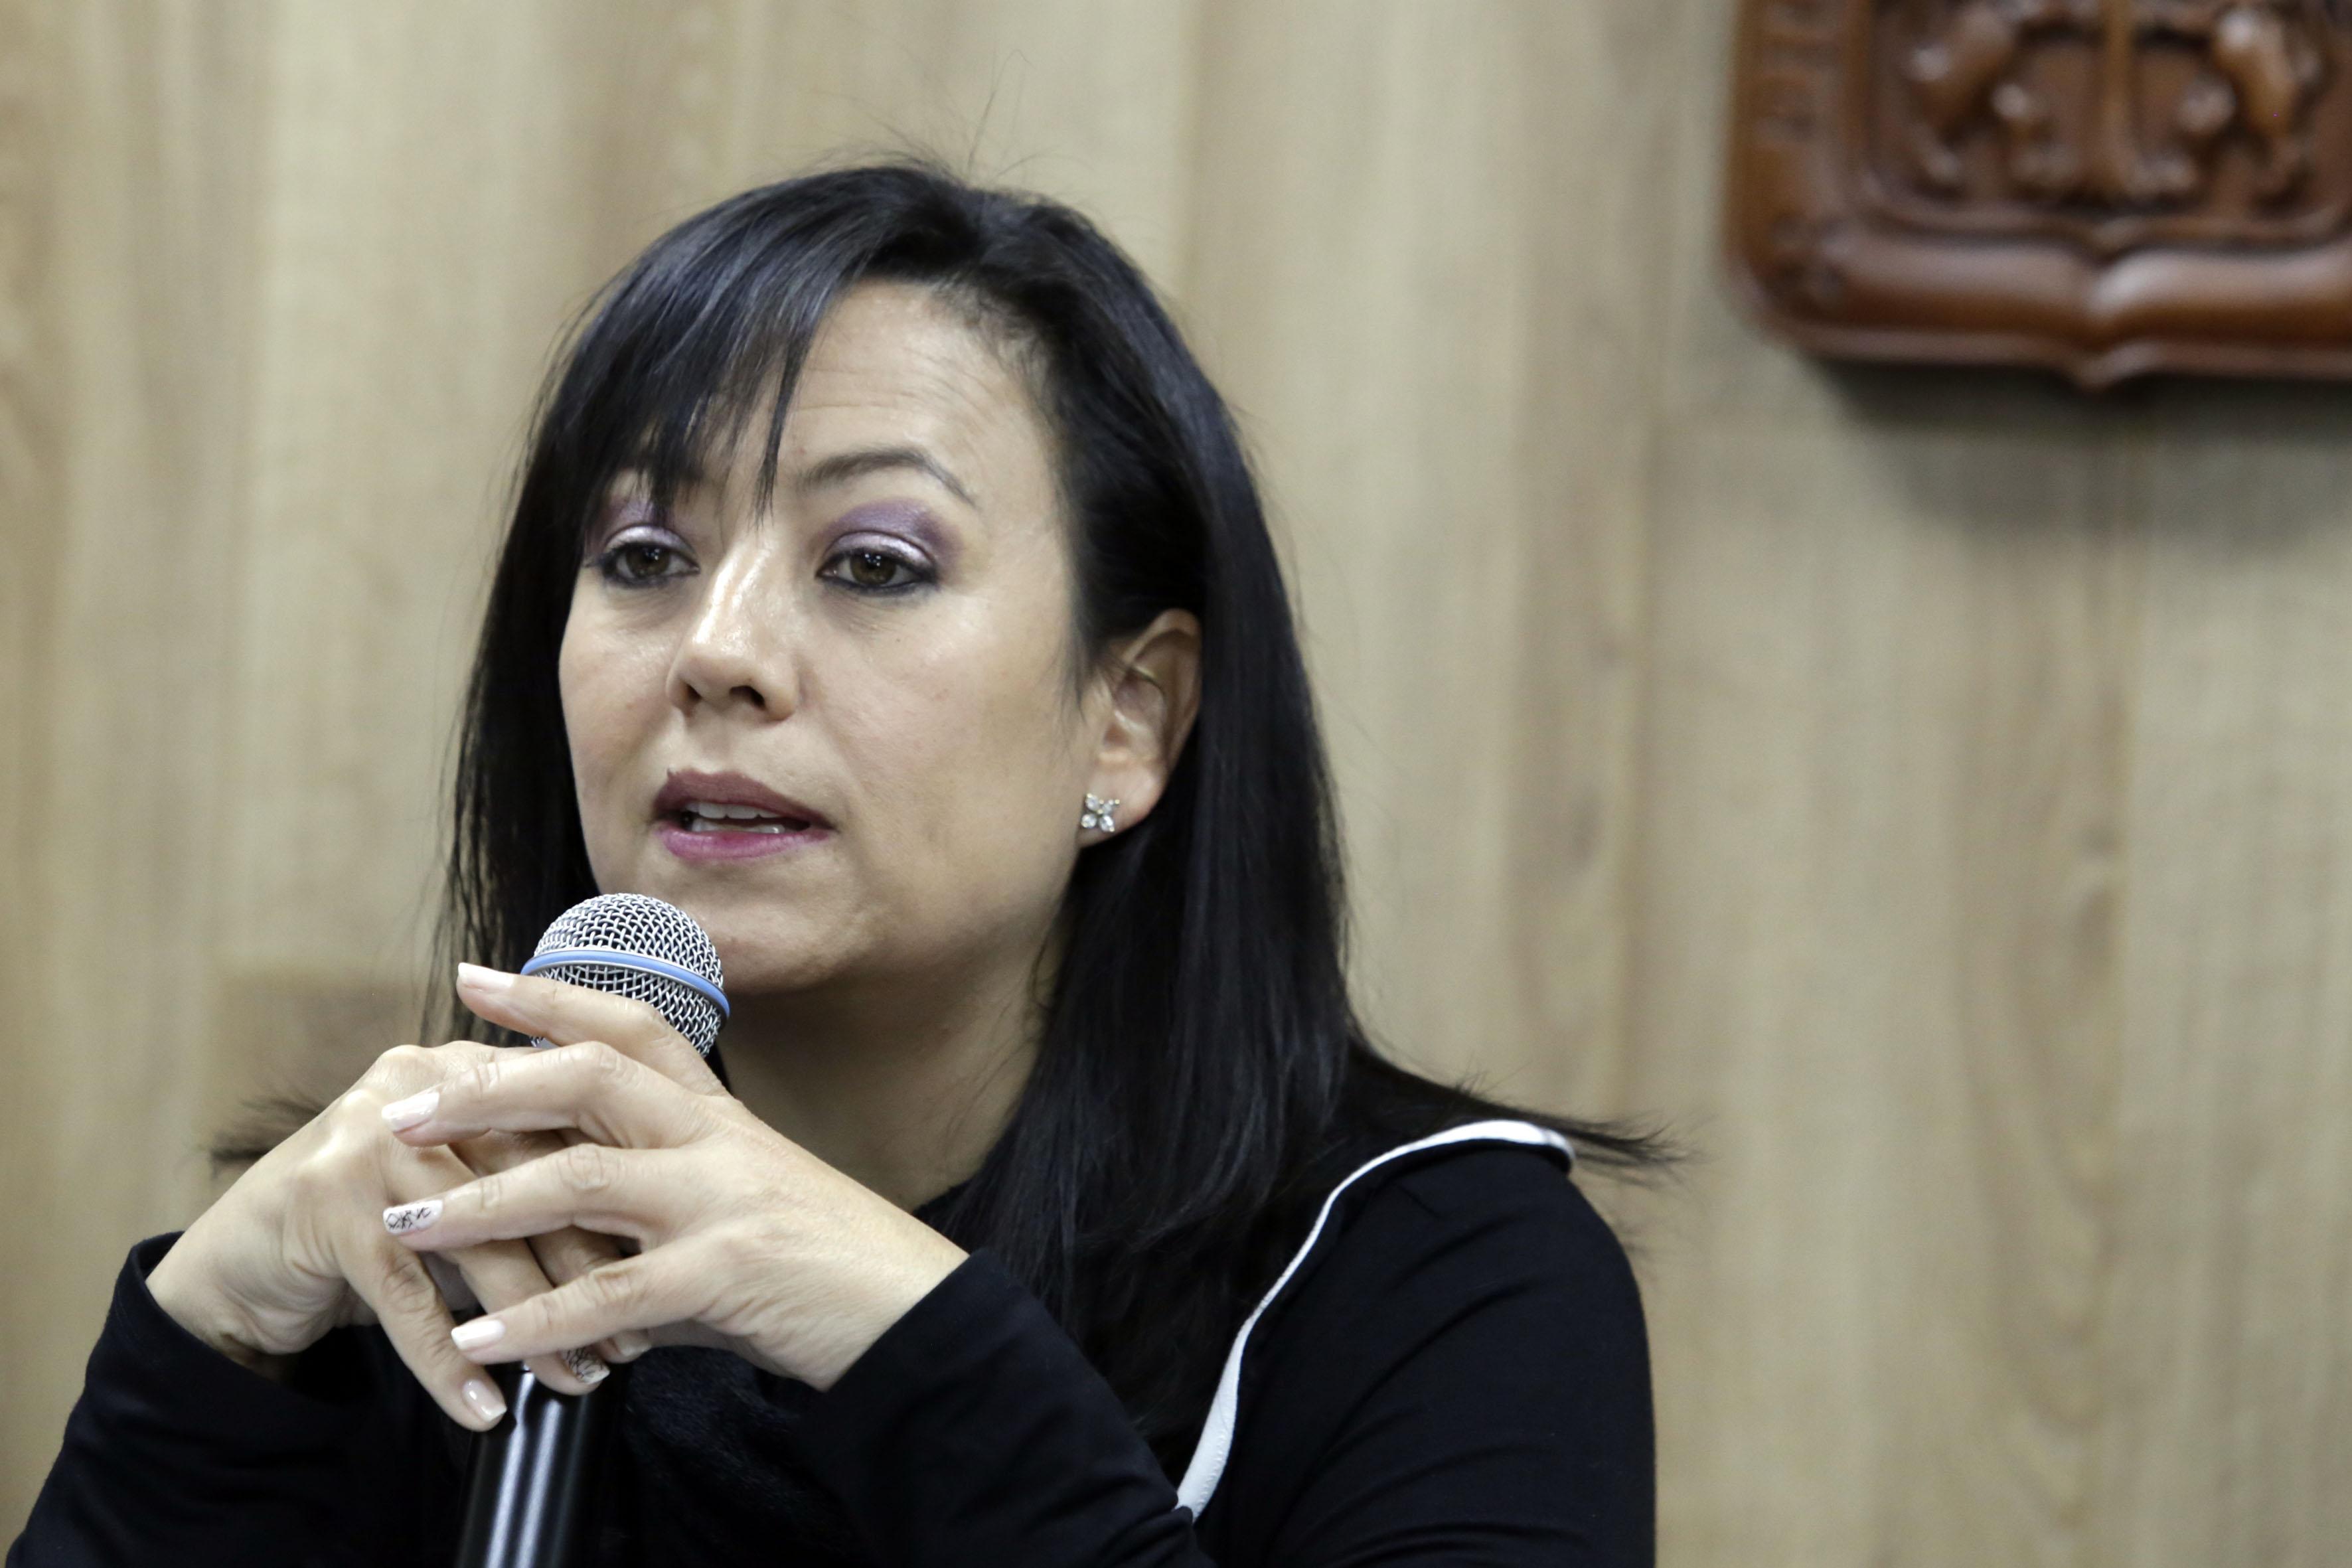 Dra Norma Ruvalcaba al micrófono en la rueda de prensa